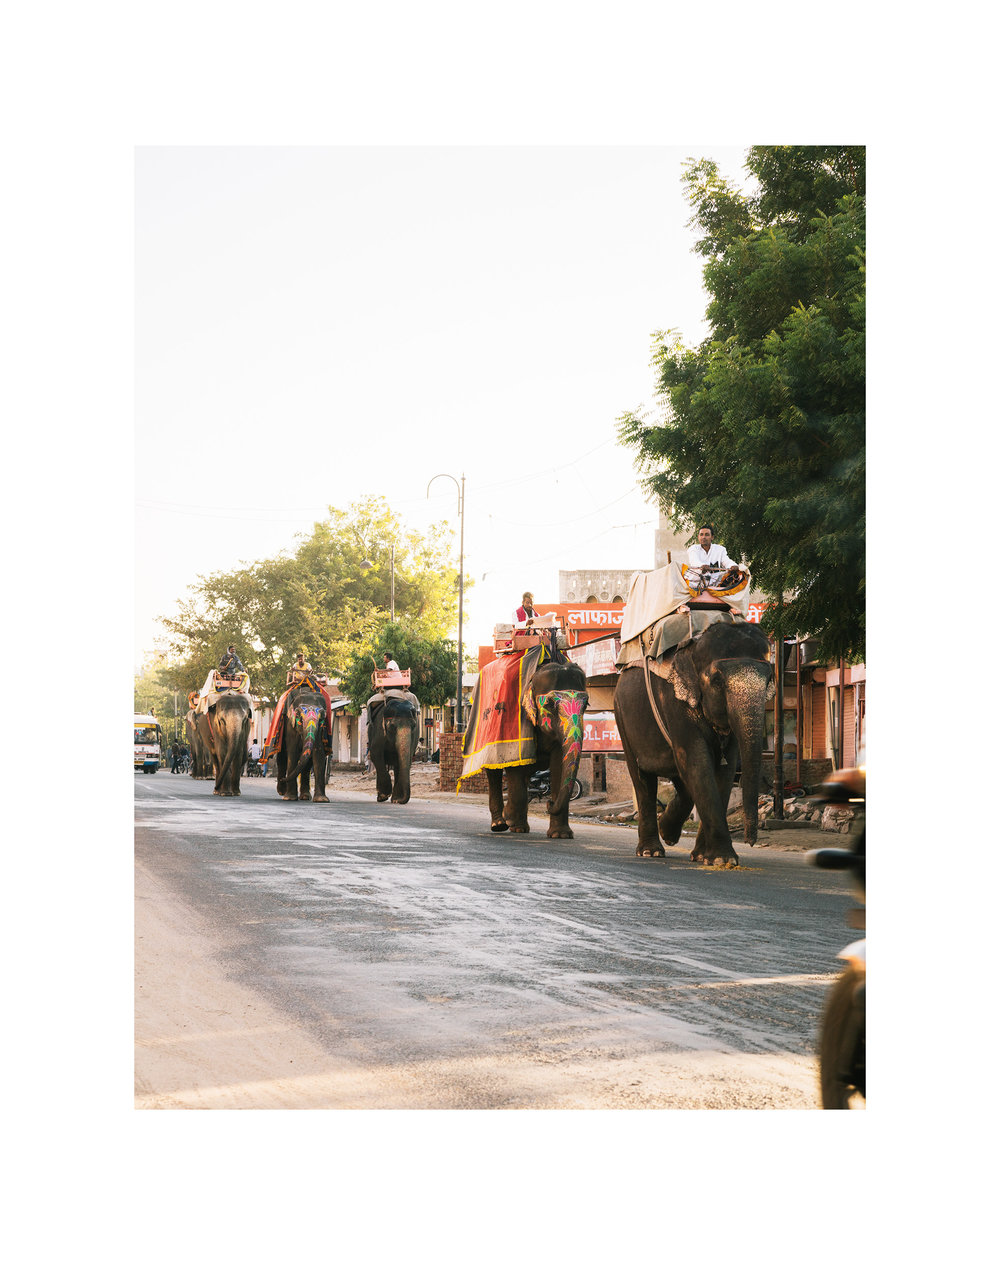 5113_Elephants.jpg